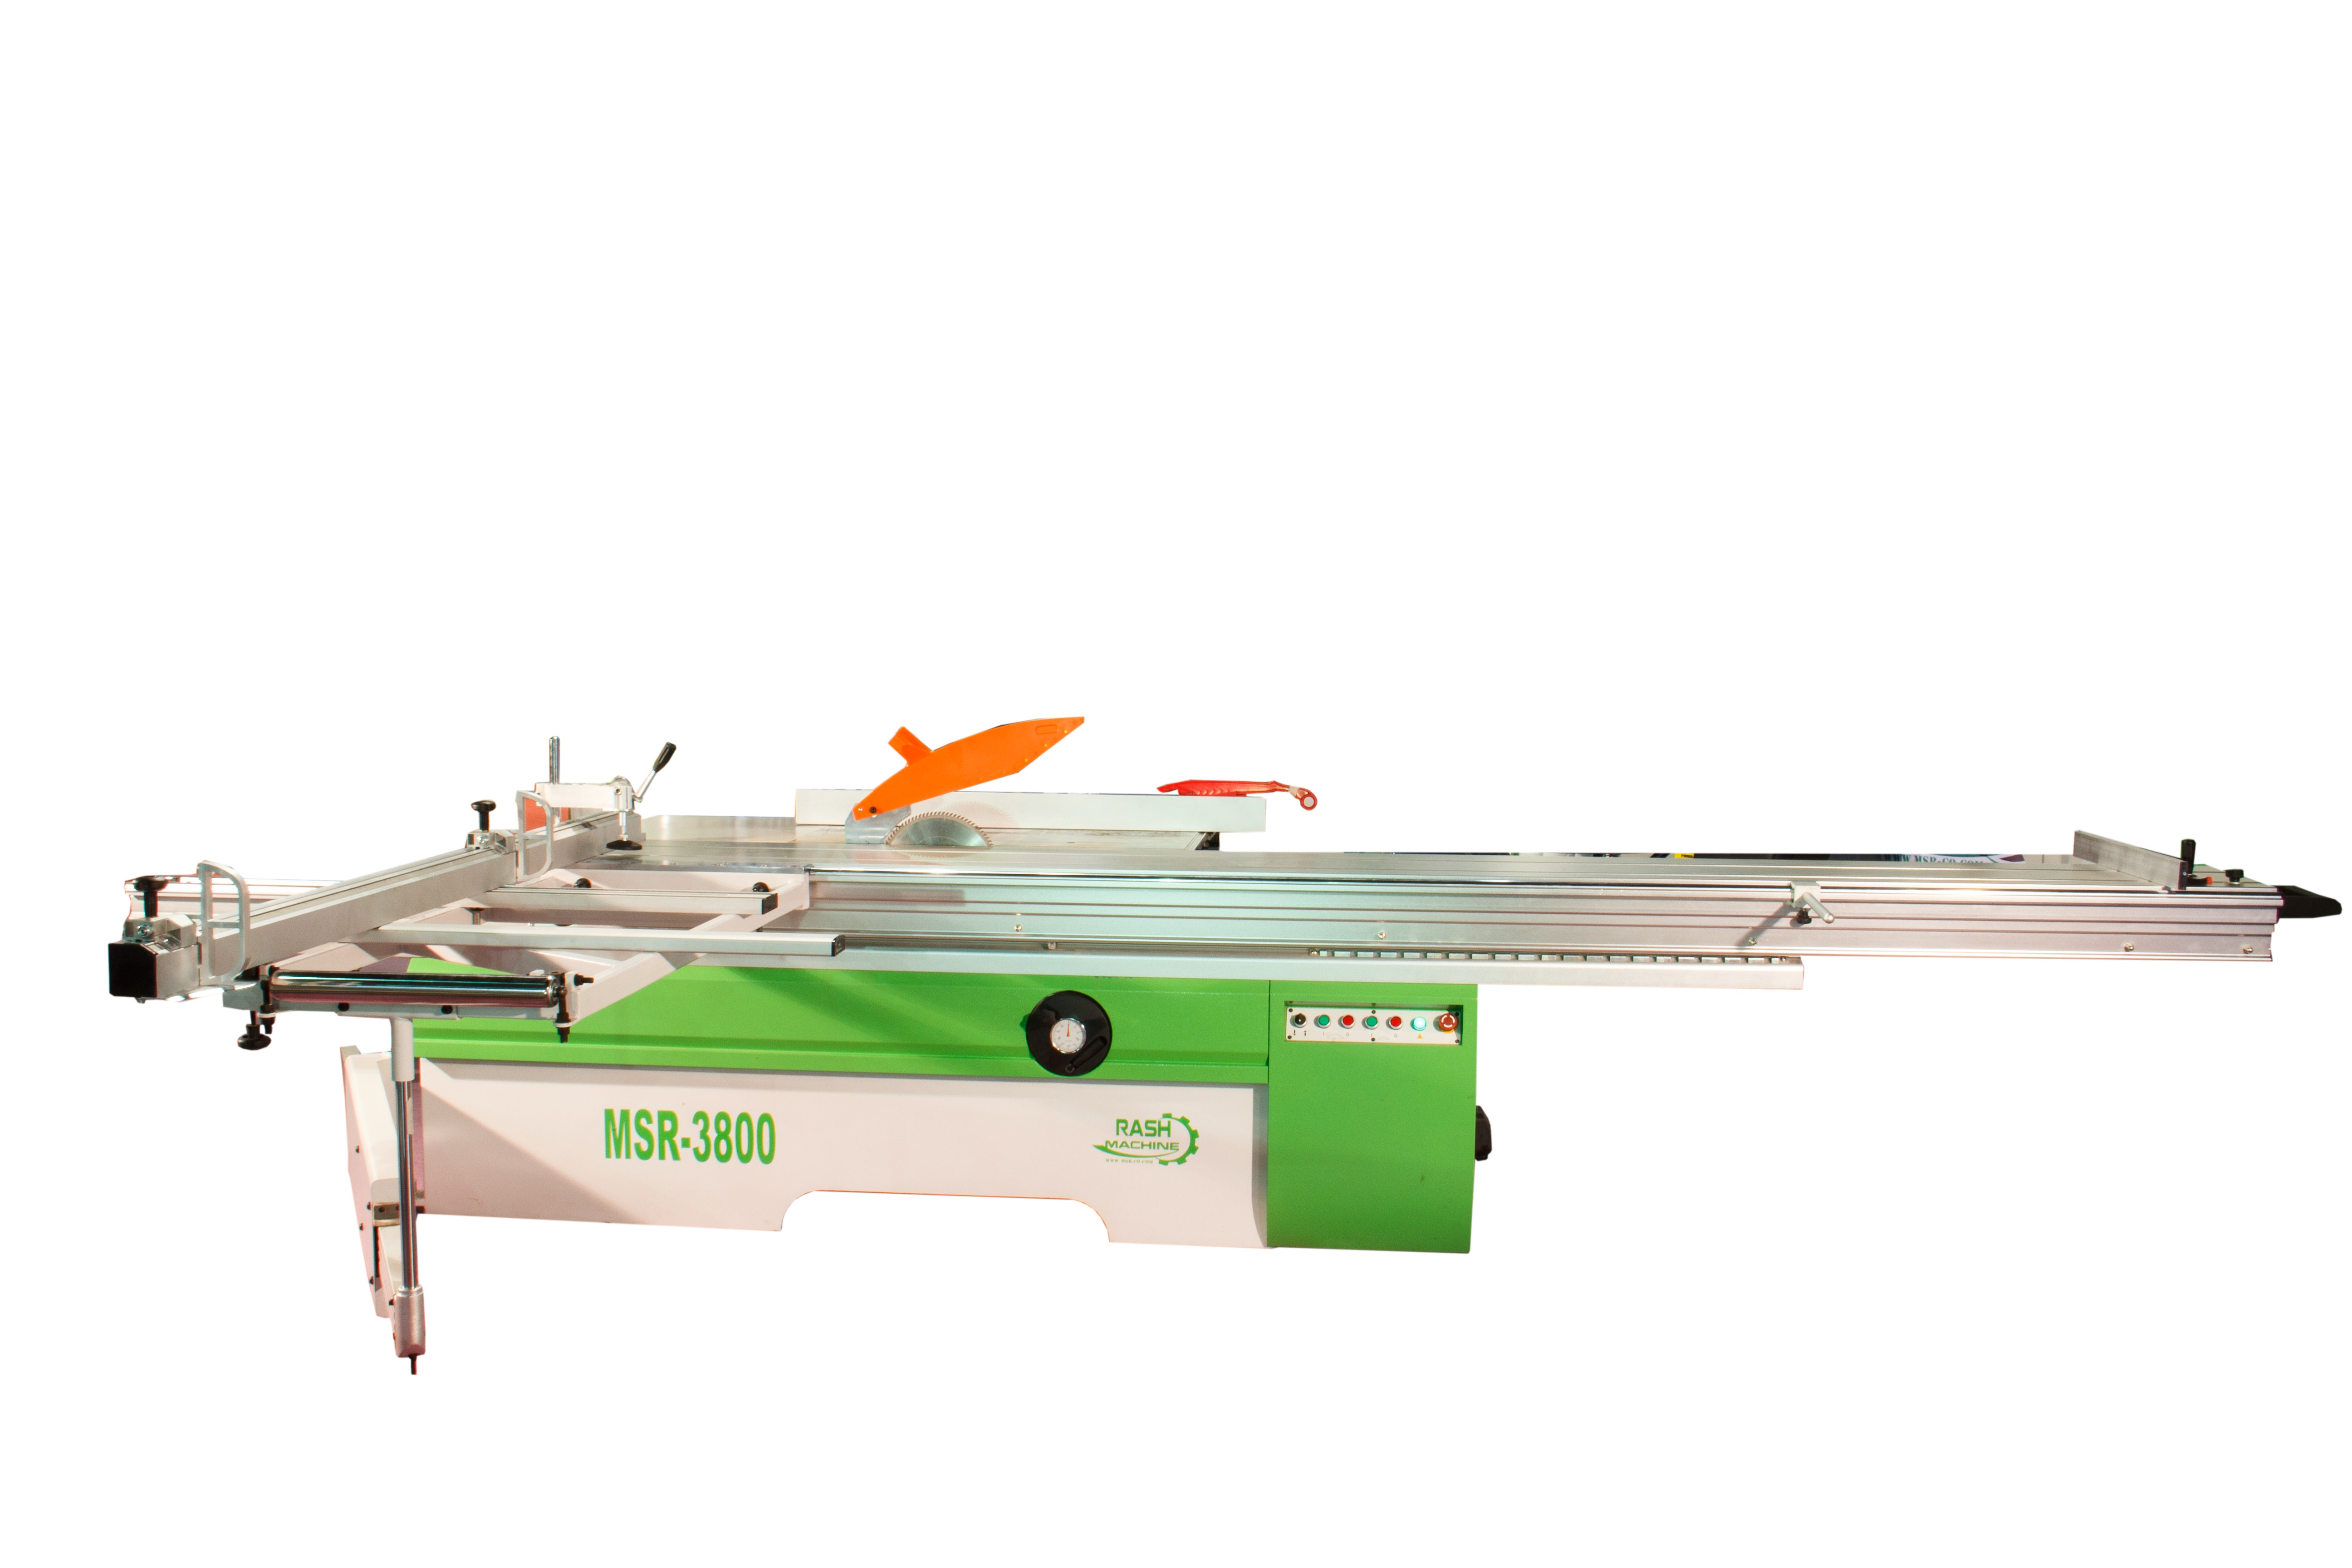 دور کن MSR-3800